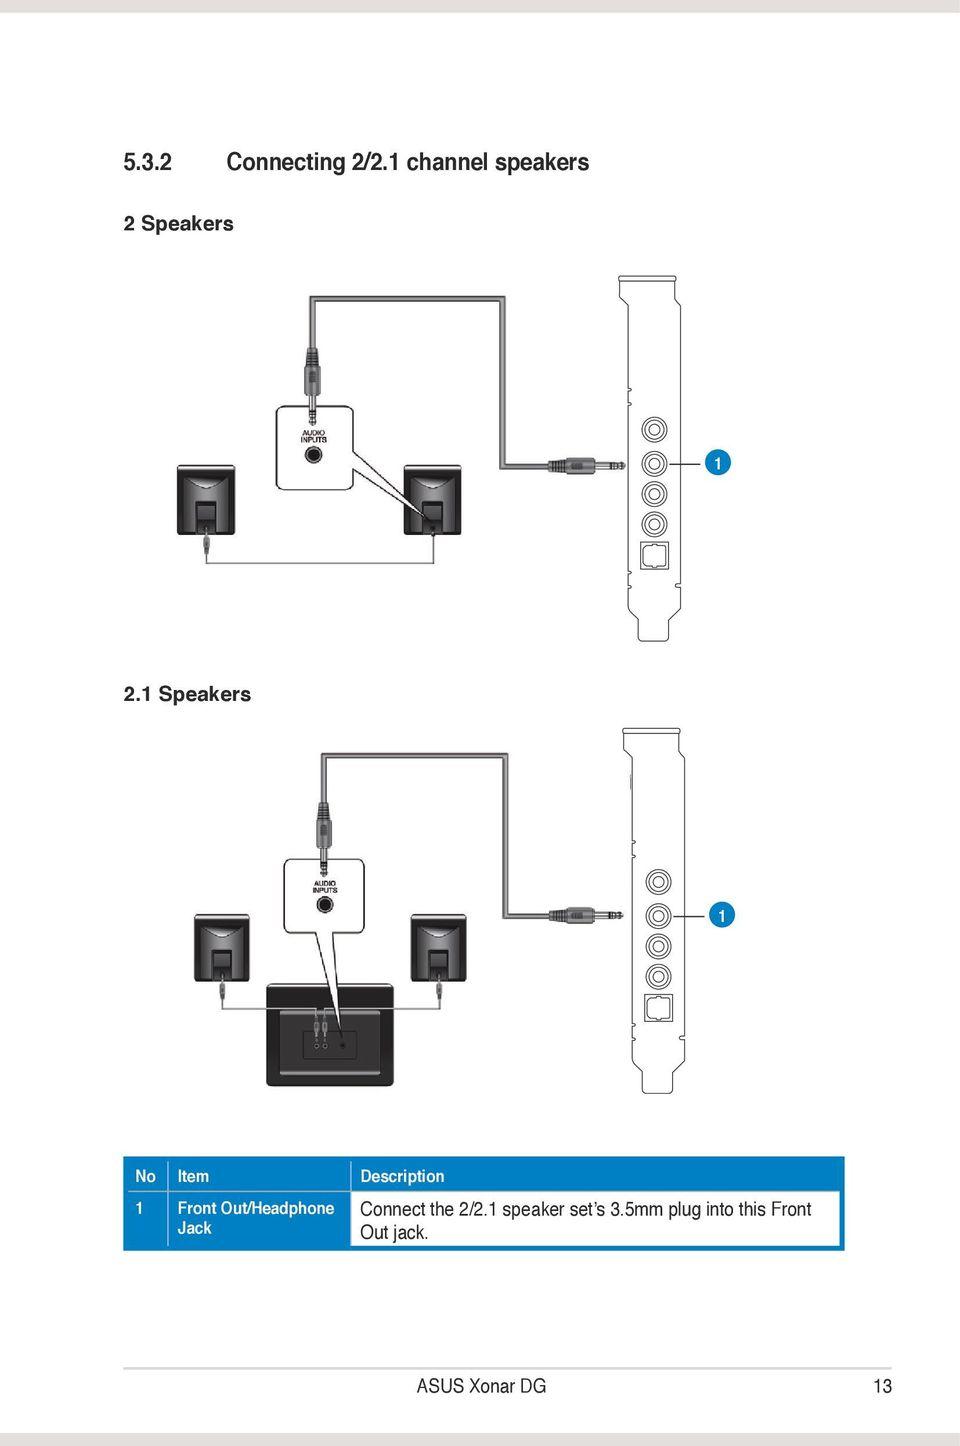 Xonar DG. PCI 5.1 & Headphone Amp Audio Card. User manual